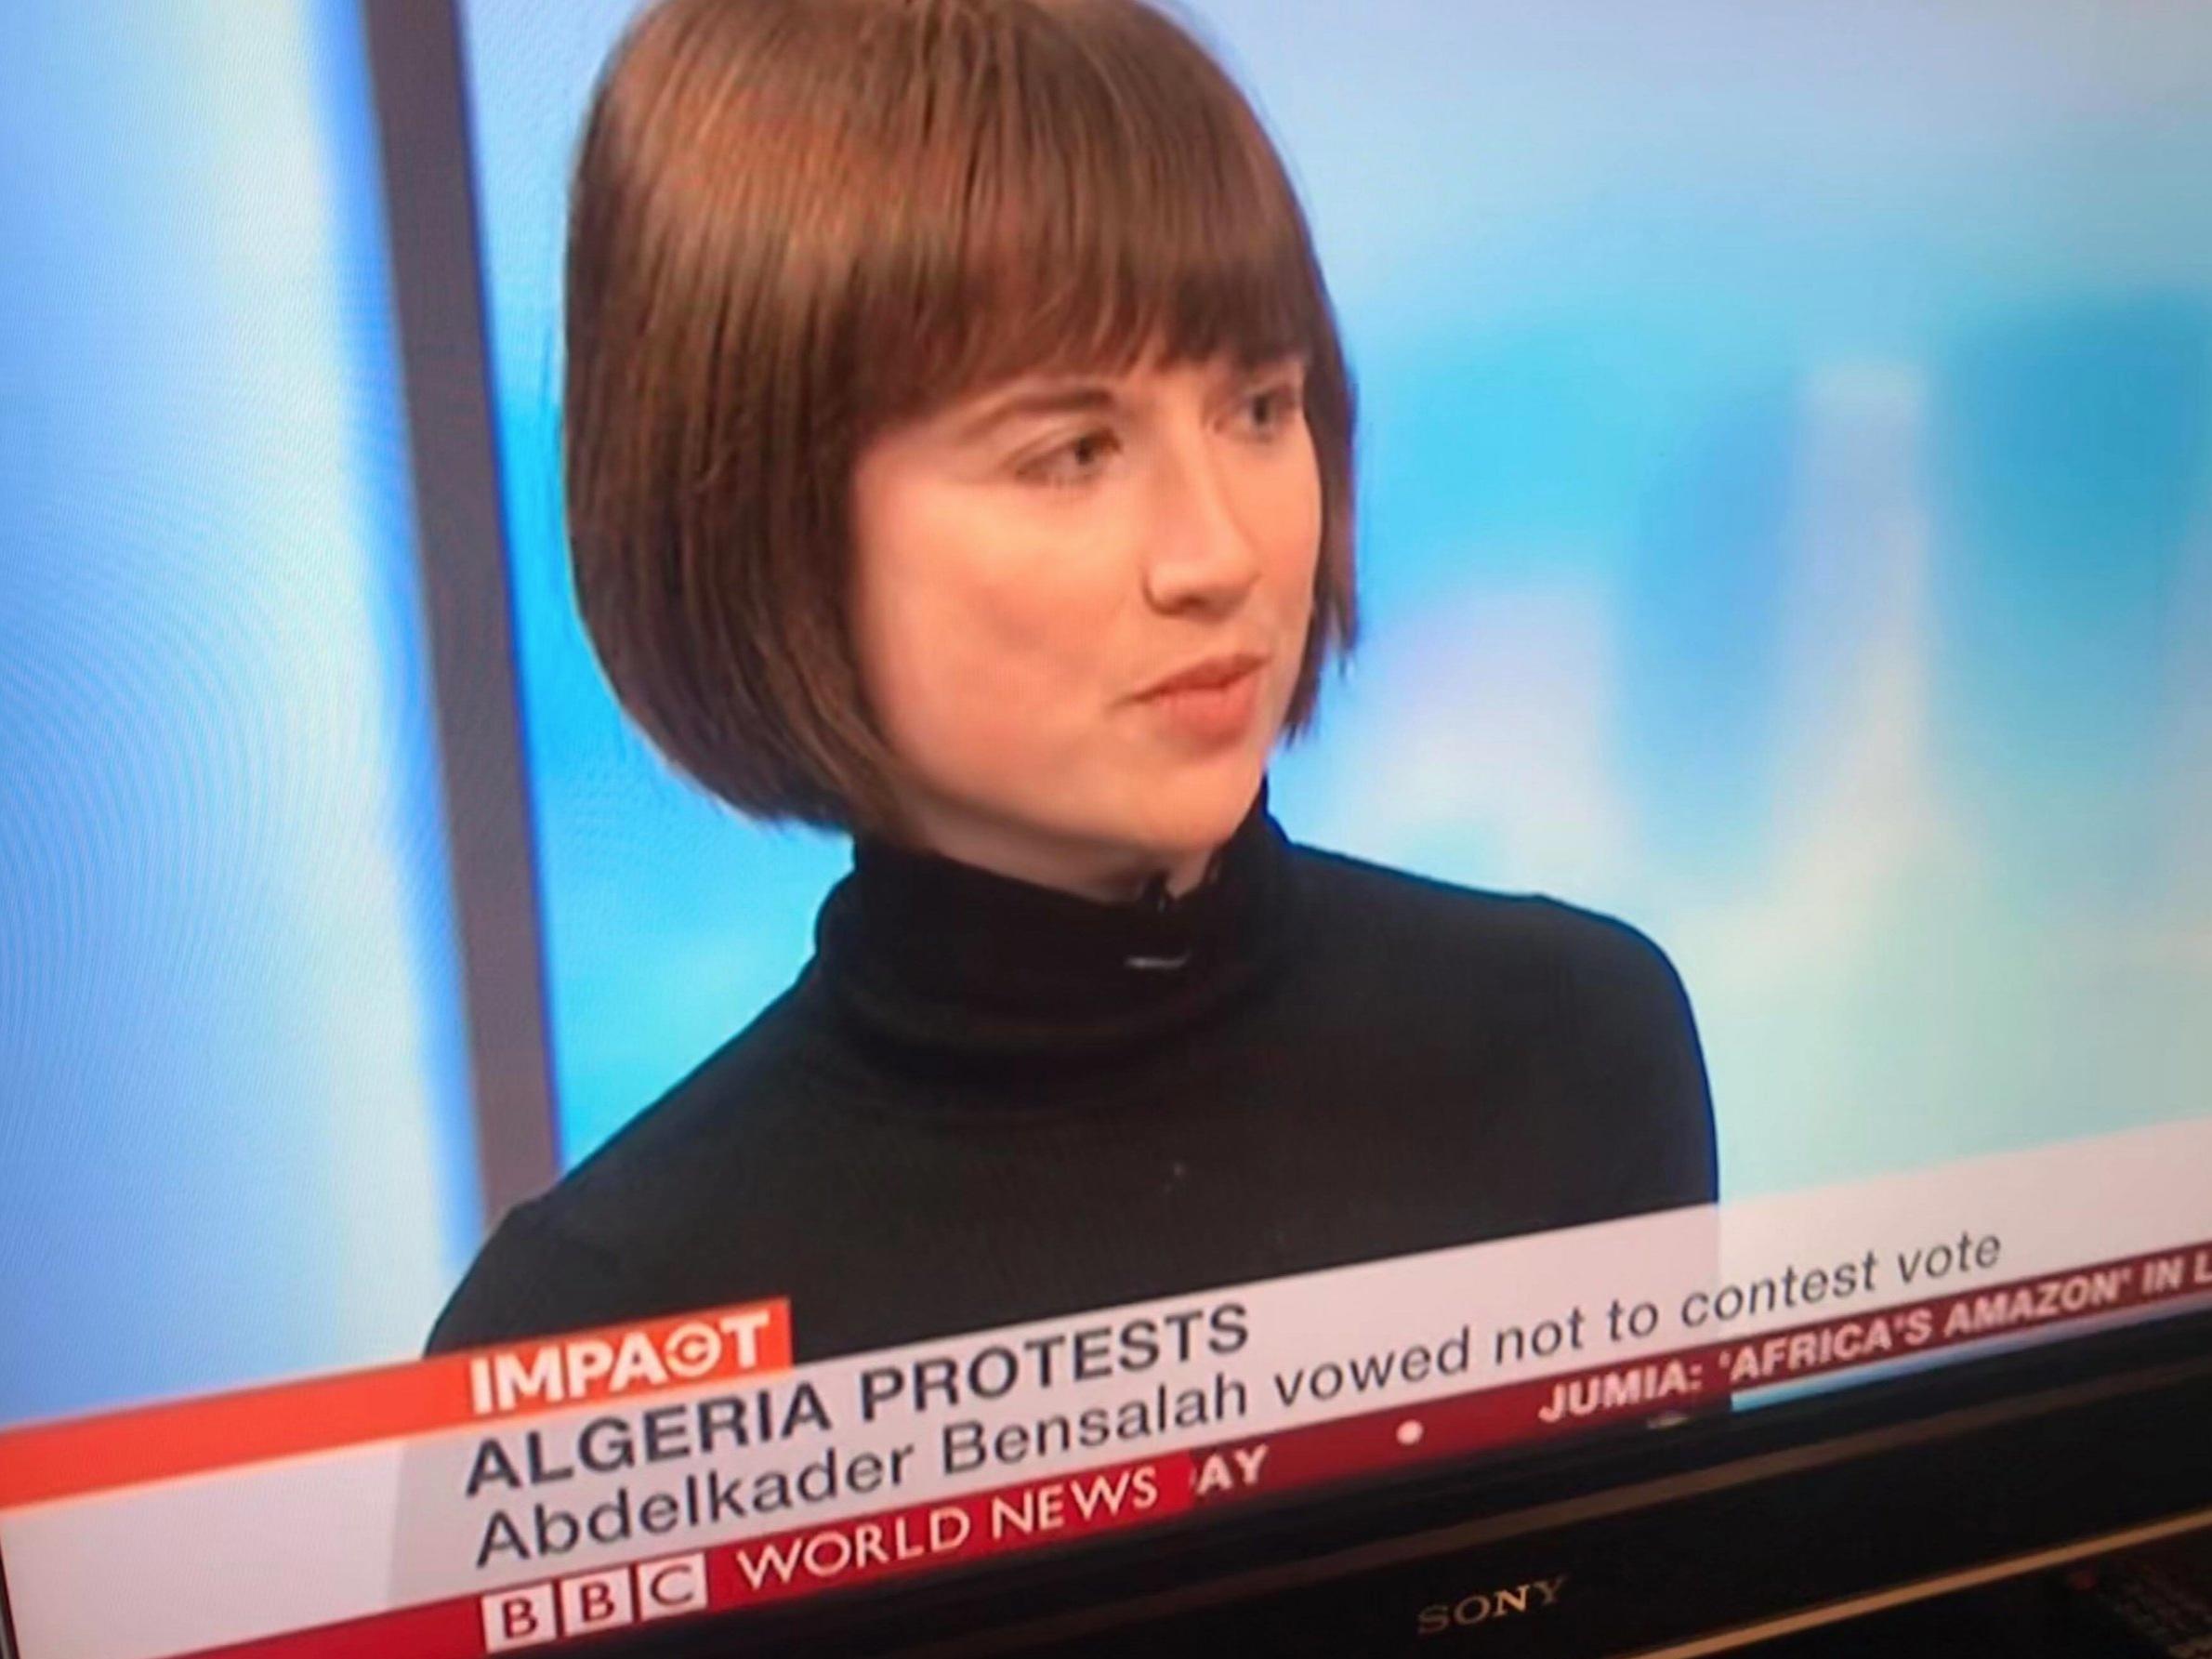 BBC World news Studio interview on Protests in Algeria - 12 April 2019